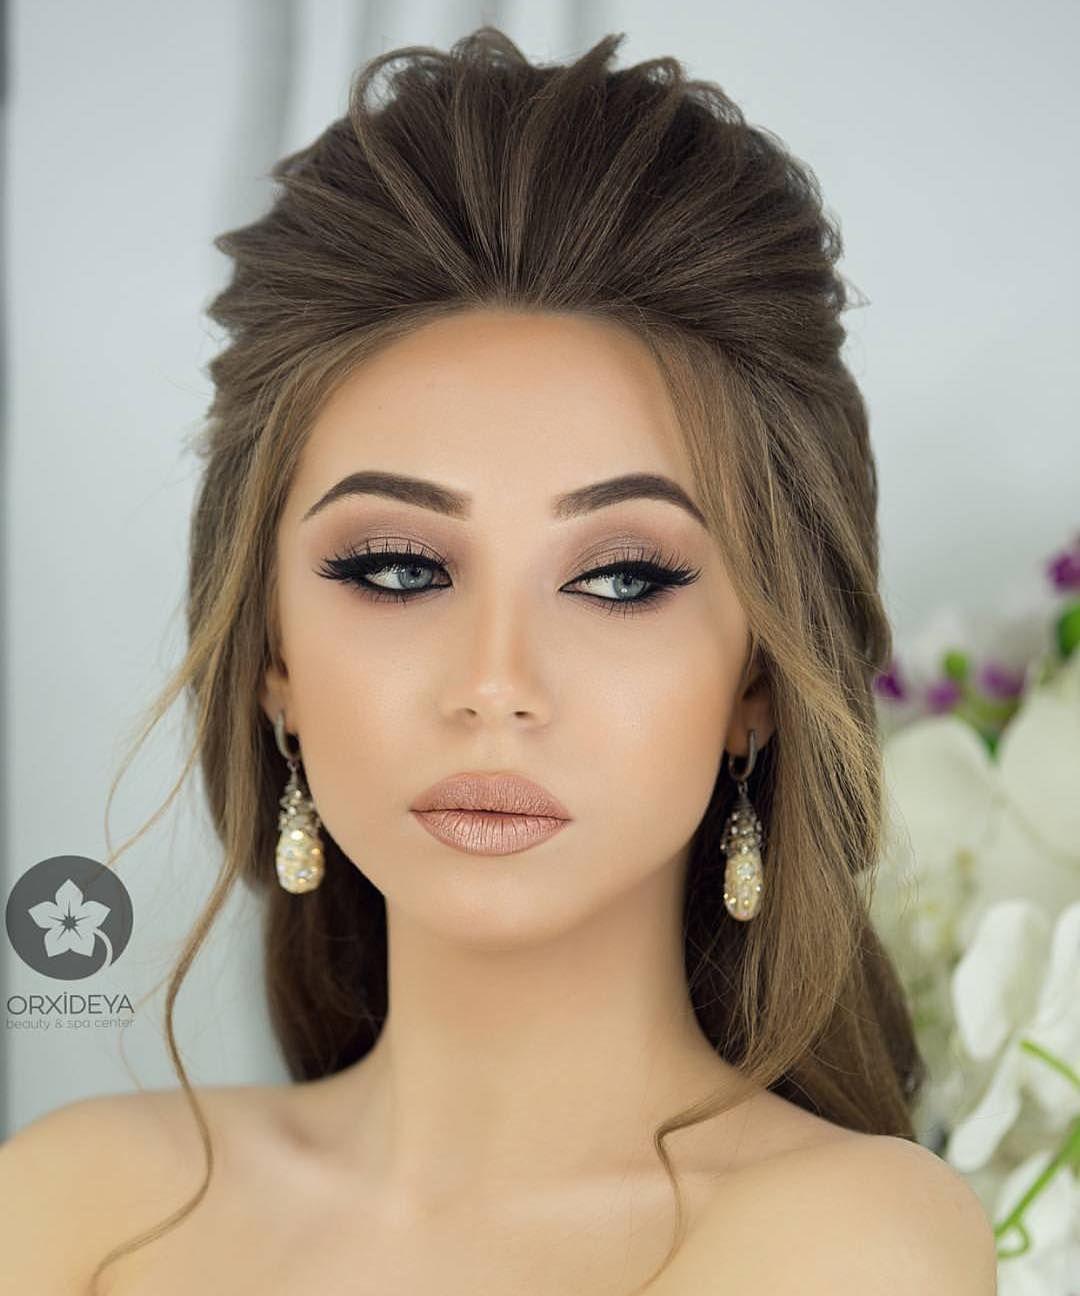 Pin by Koce Fifi on prichrski | Wedding hair, makeup, Long ...